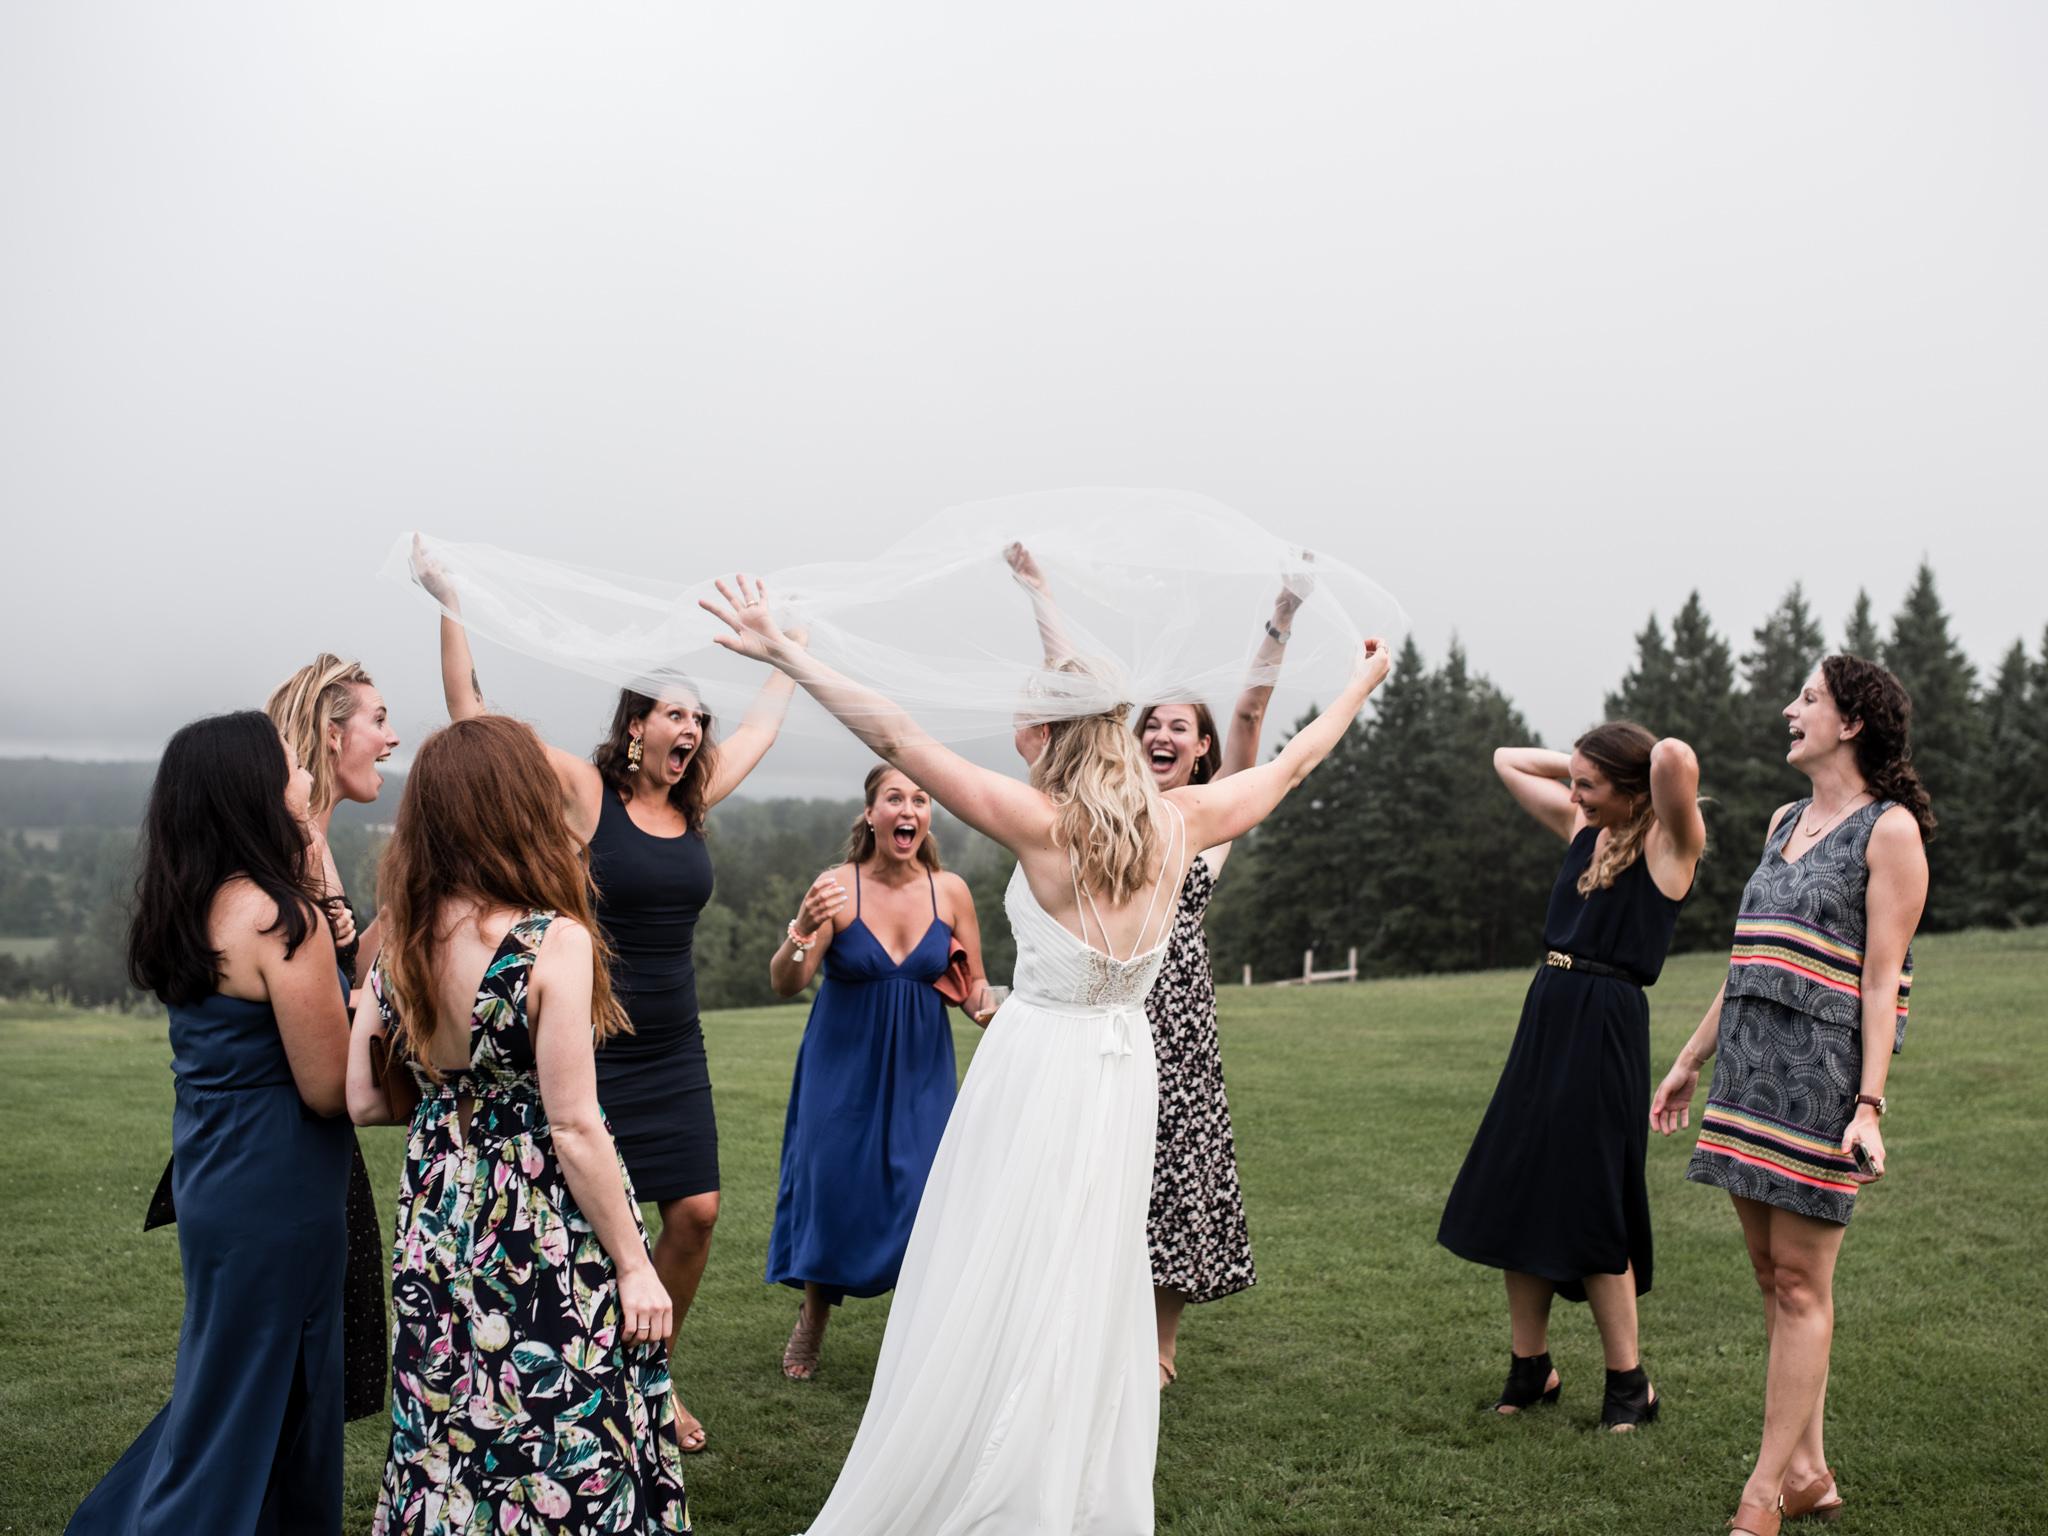 skyloft-wedding-toronto-wedding-photographer-52.jpg